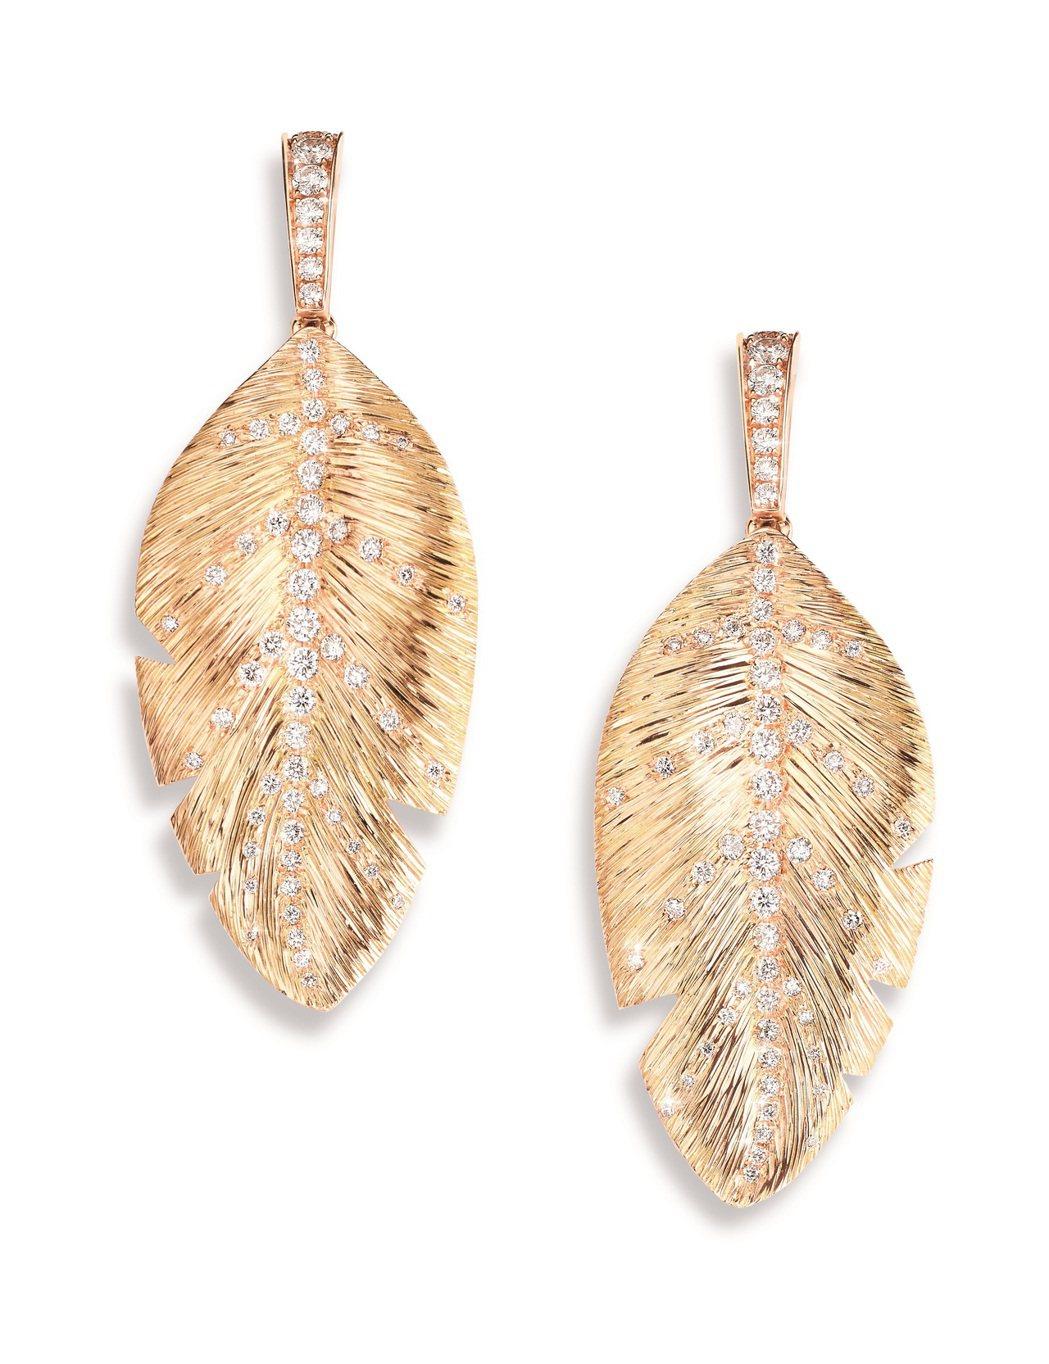 Extremely Piaget 系列棕櫚葉耳環,18K玫瑰金鑲嵌120顆共約1...